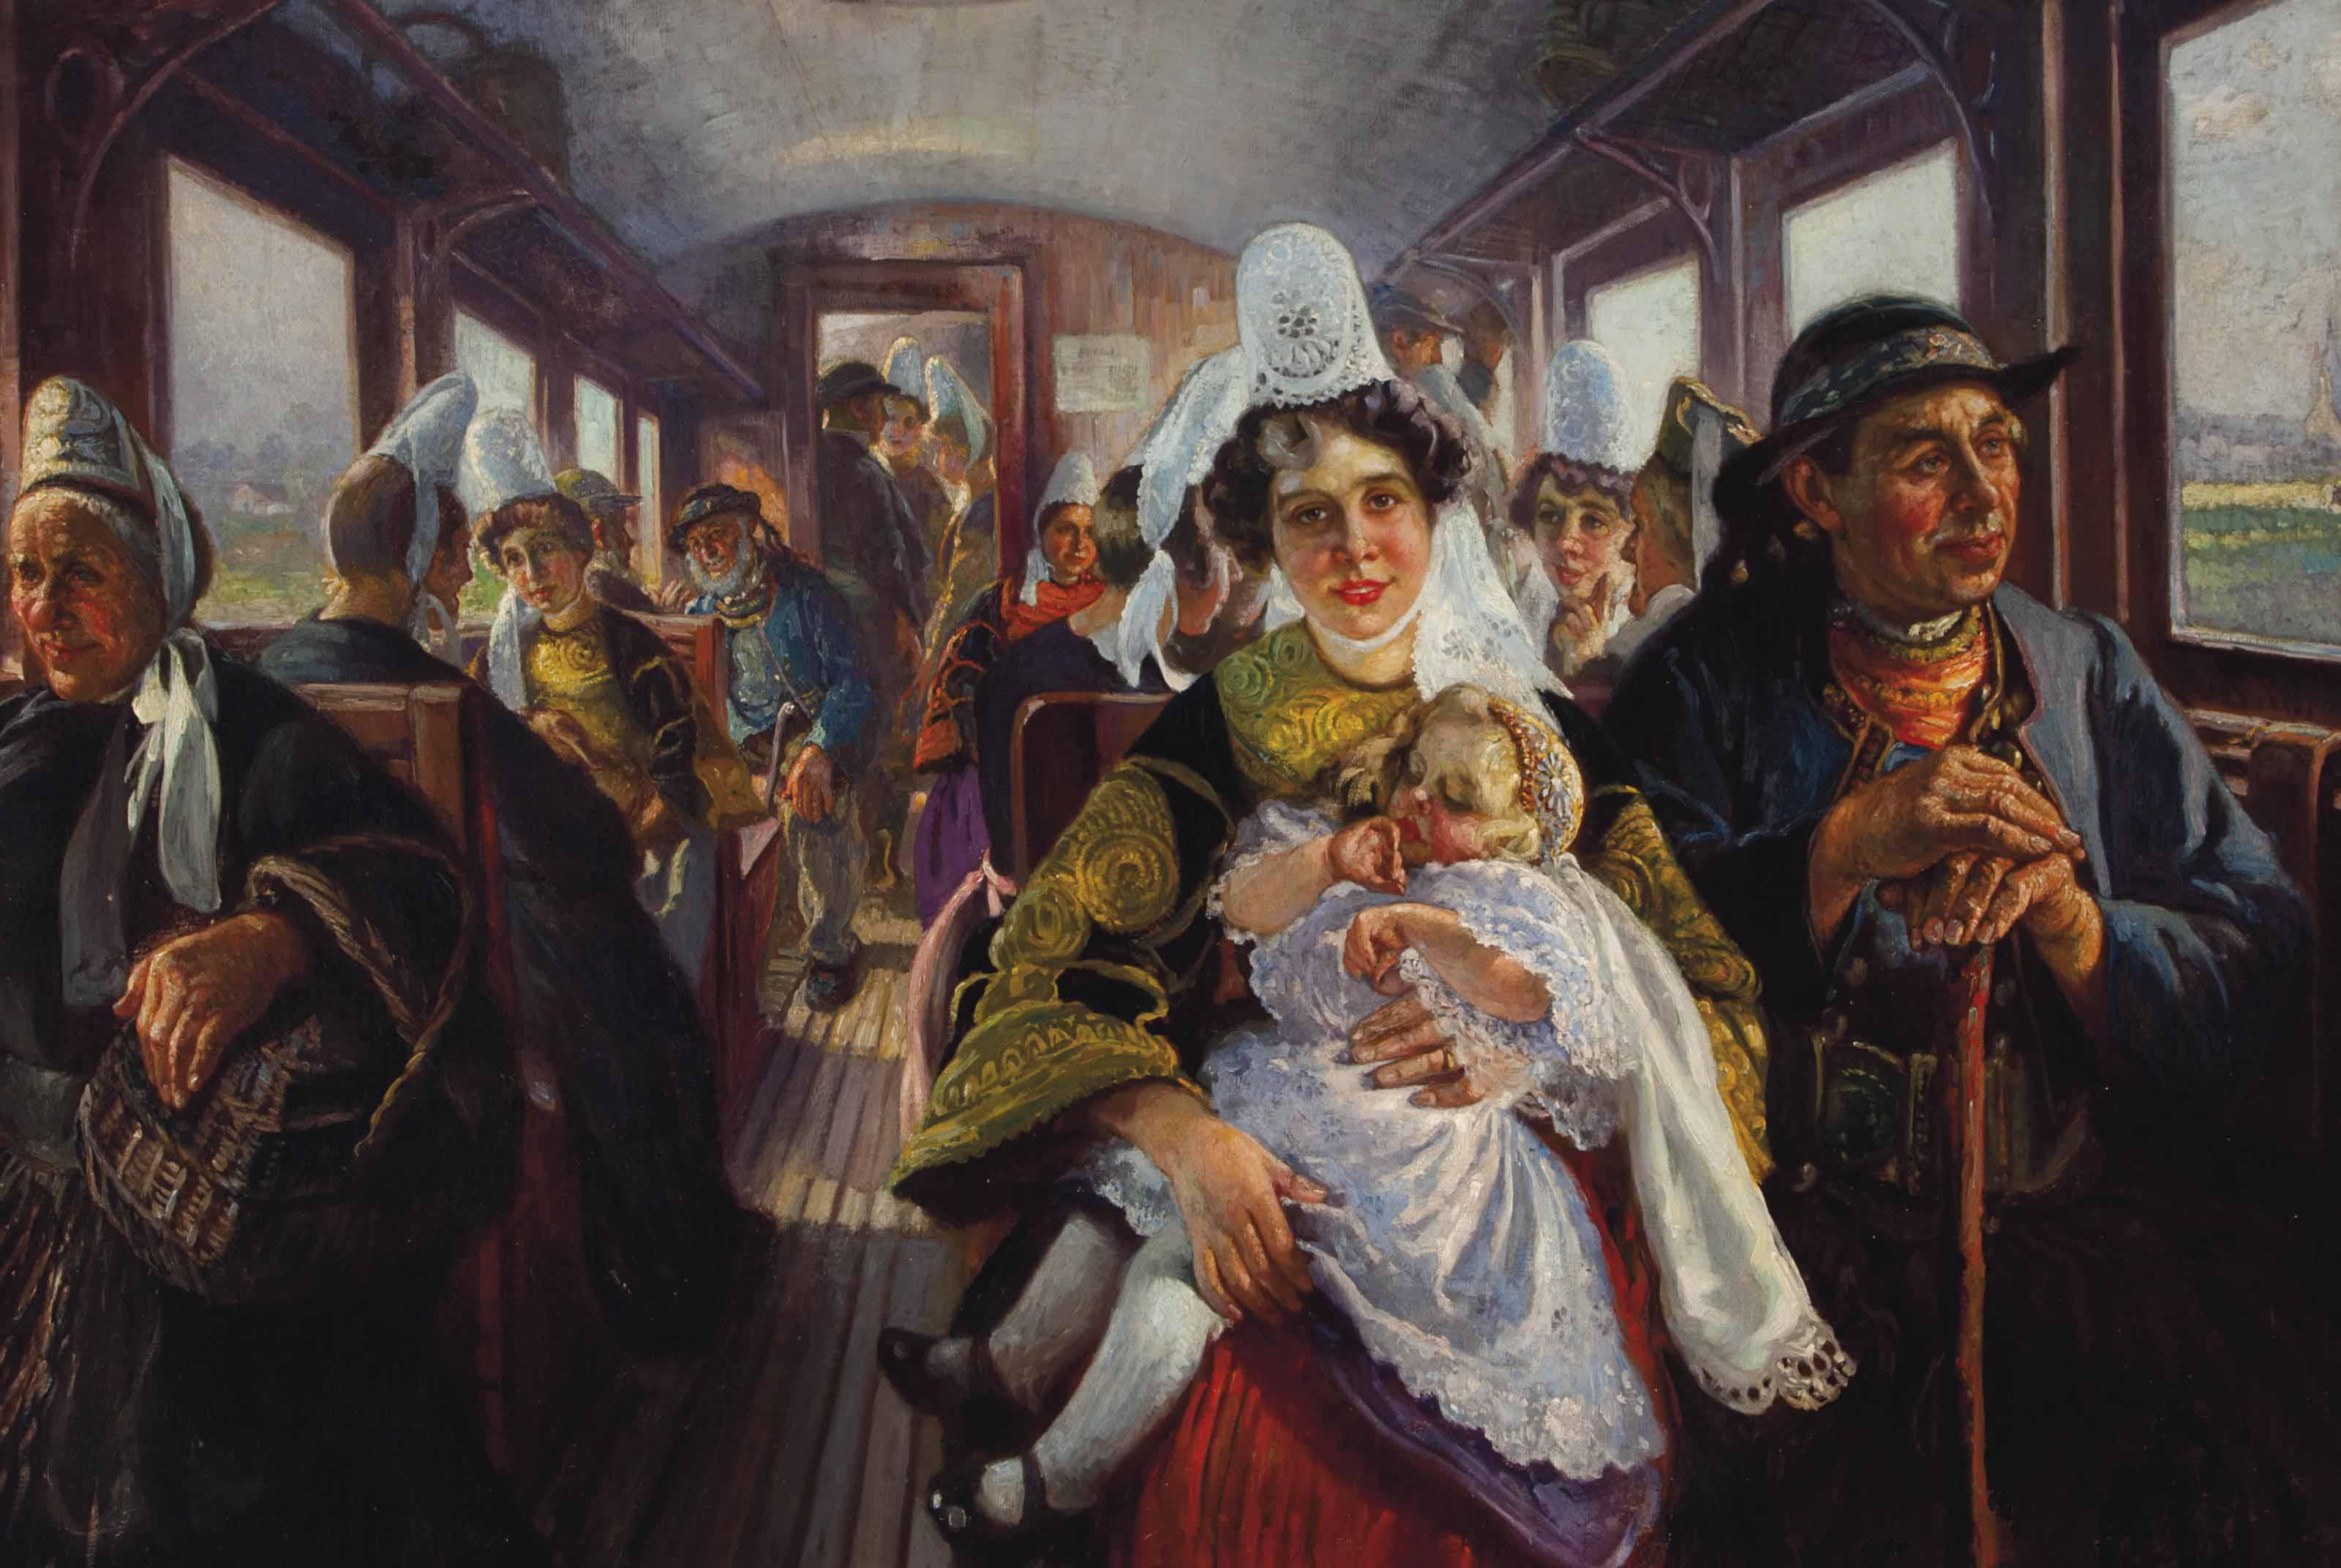 A family on a train